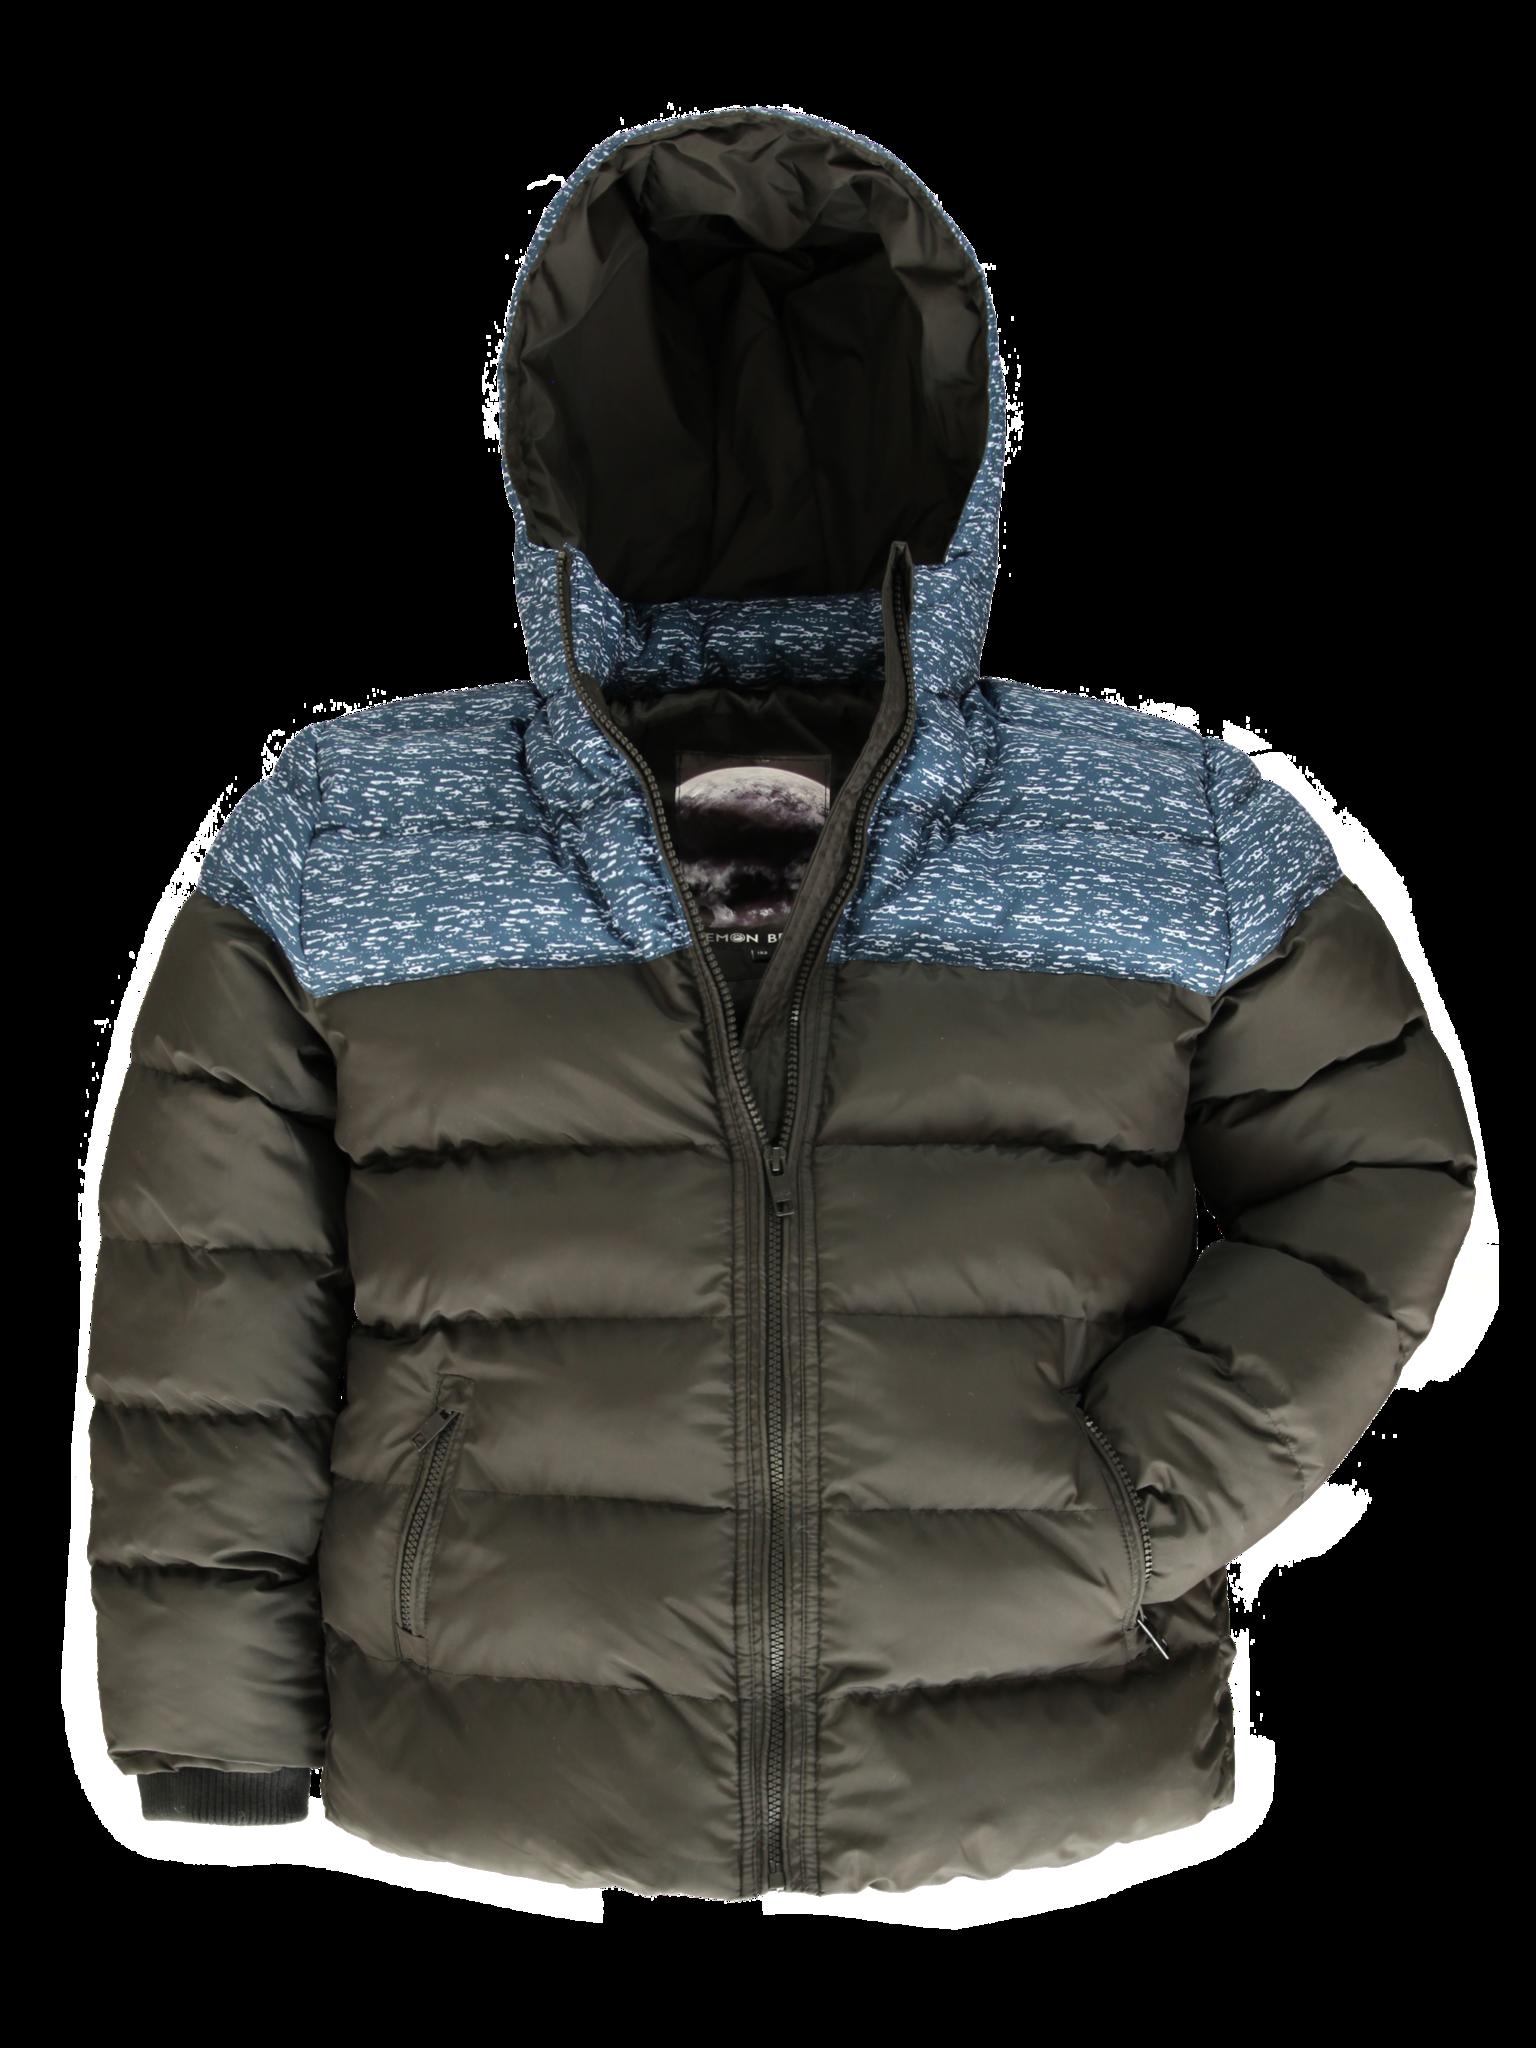 All Brands | Winterproducts Teen Boys | Jacket | 10 pcs/box